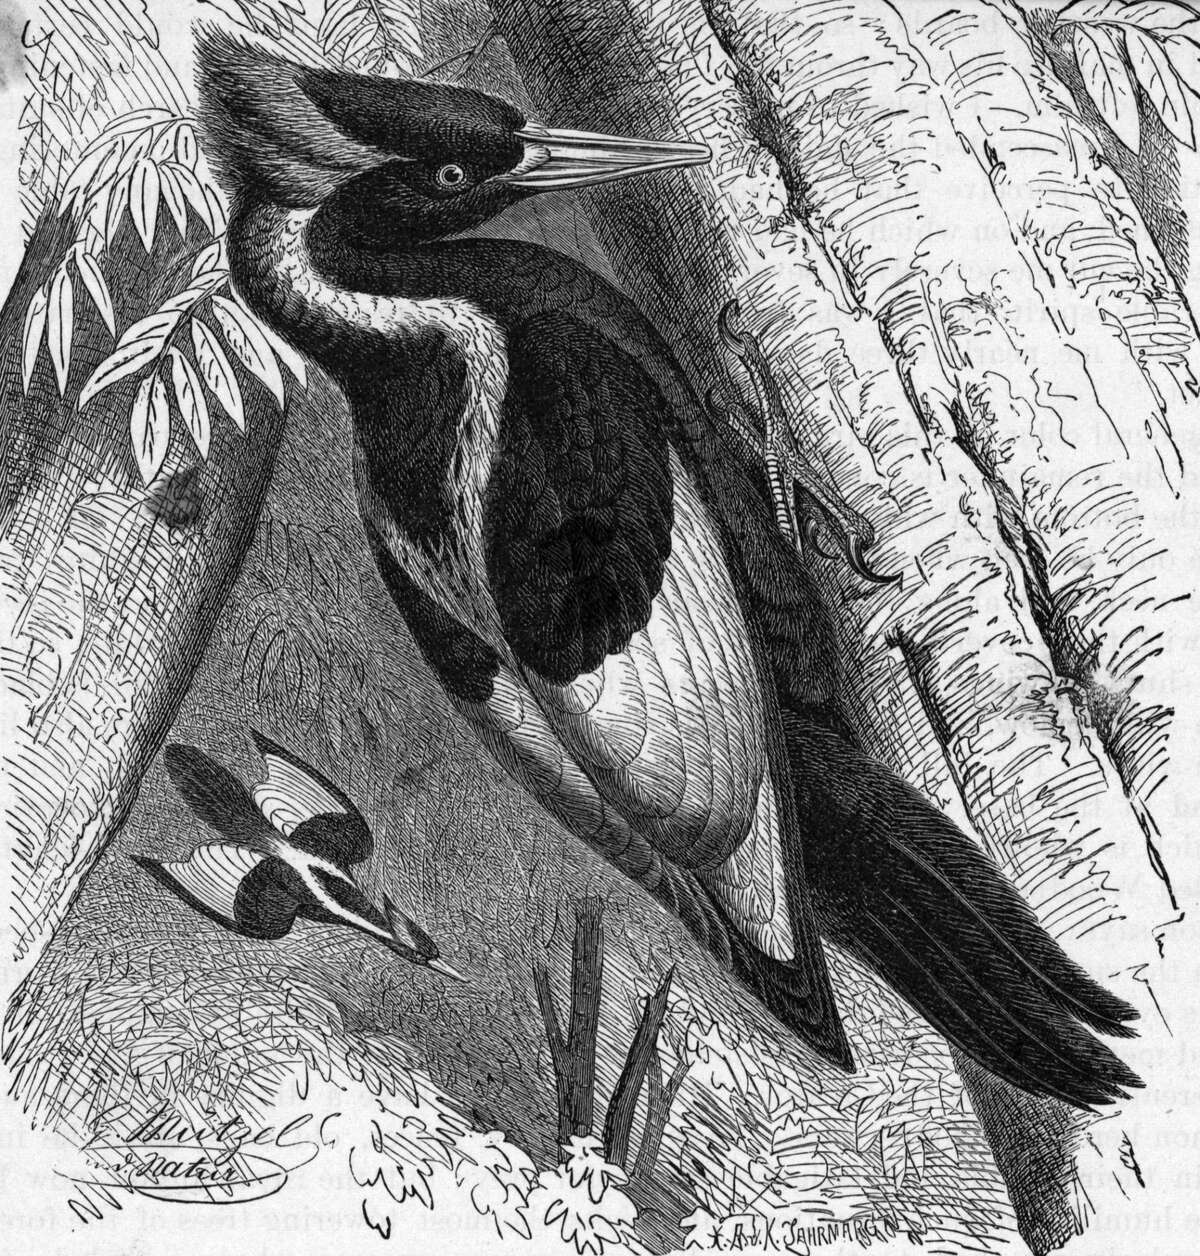 Ivory-billed woodpecker (Campephilus Principalis). Undated woodcut.